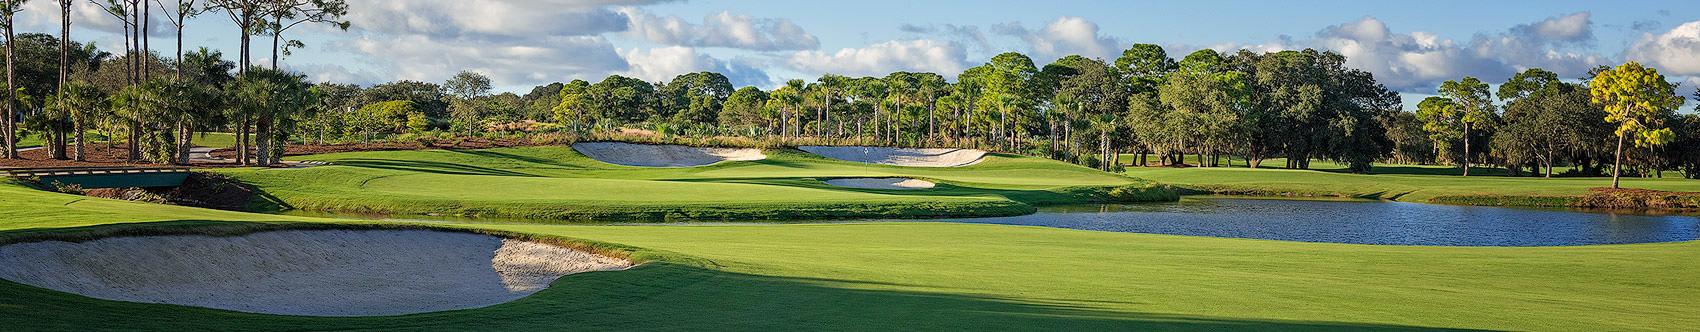 <div class='title'>           The Oaks Club, Osprey, Florida         </div>                 <div class='description'>           Long shadows on the 9th, The Heron Course, The Oaks Club, Osprey, Florida.         </div>